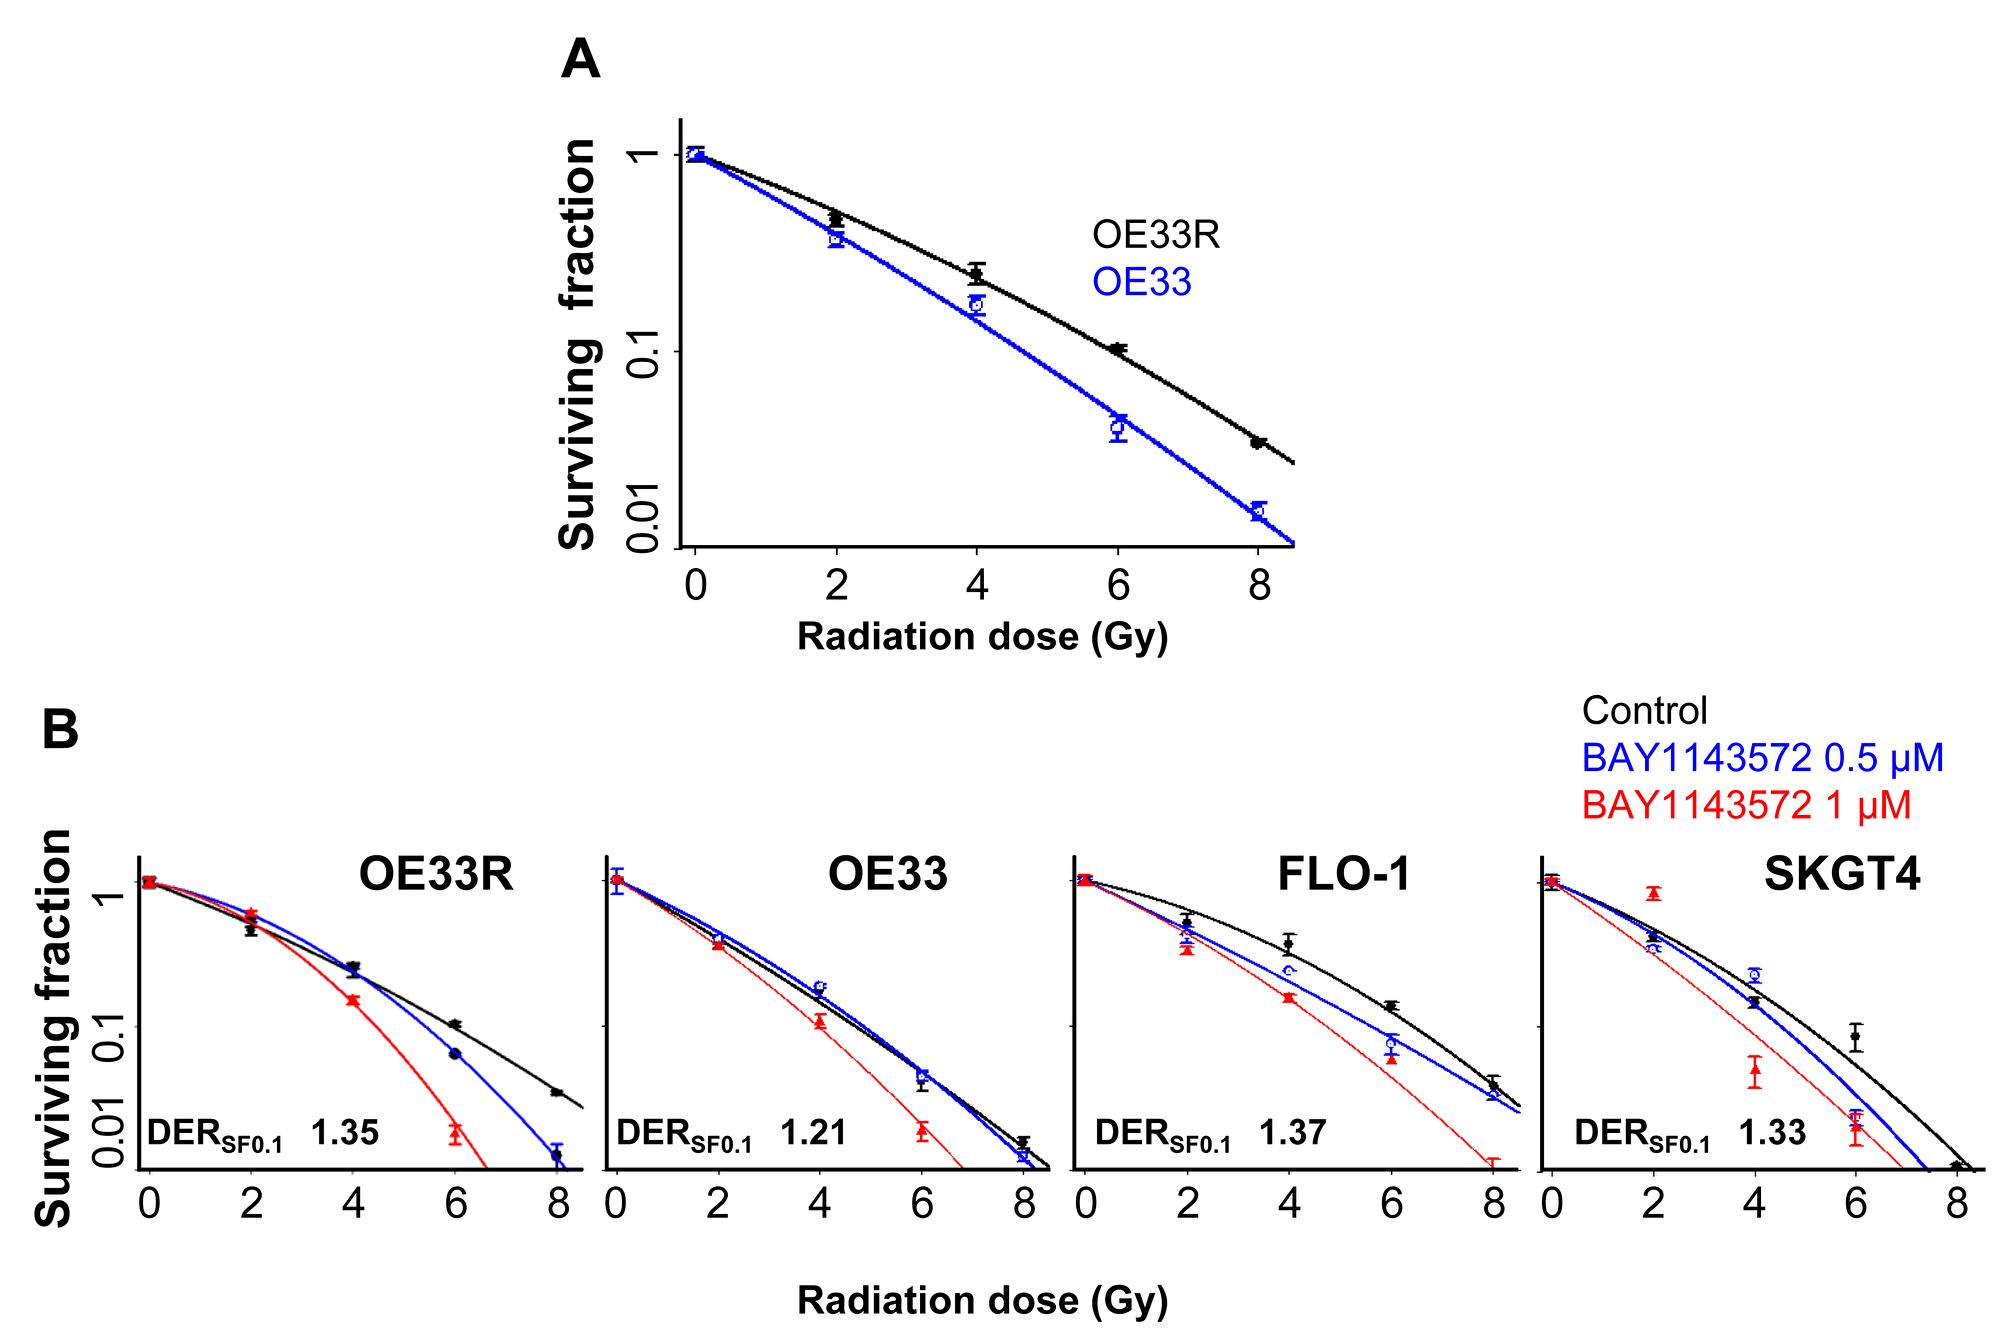 CDK9 inhibitor has potent radiosensitization efficacy in esophageal adenocarcinoma cells.